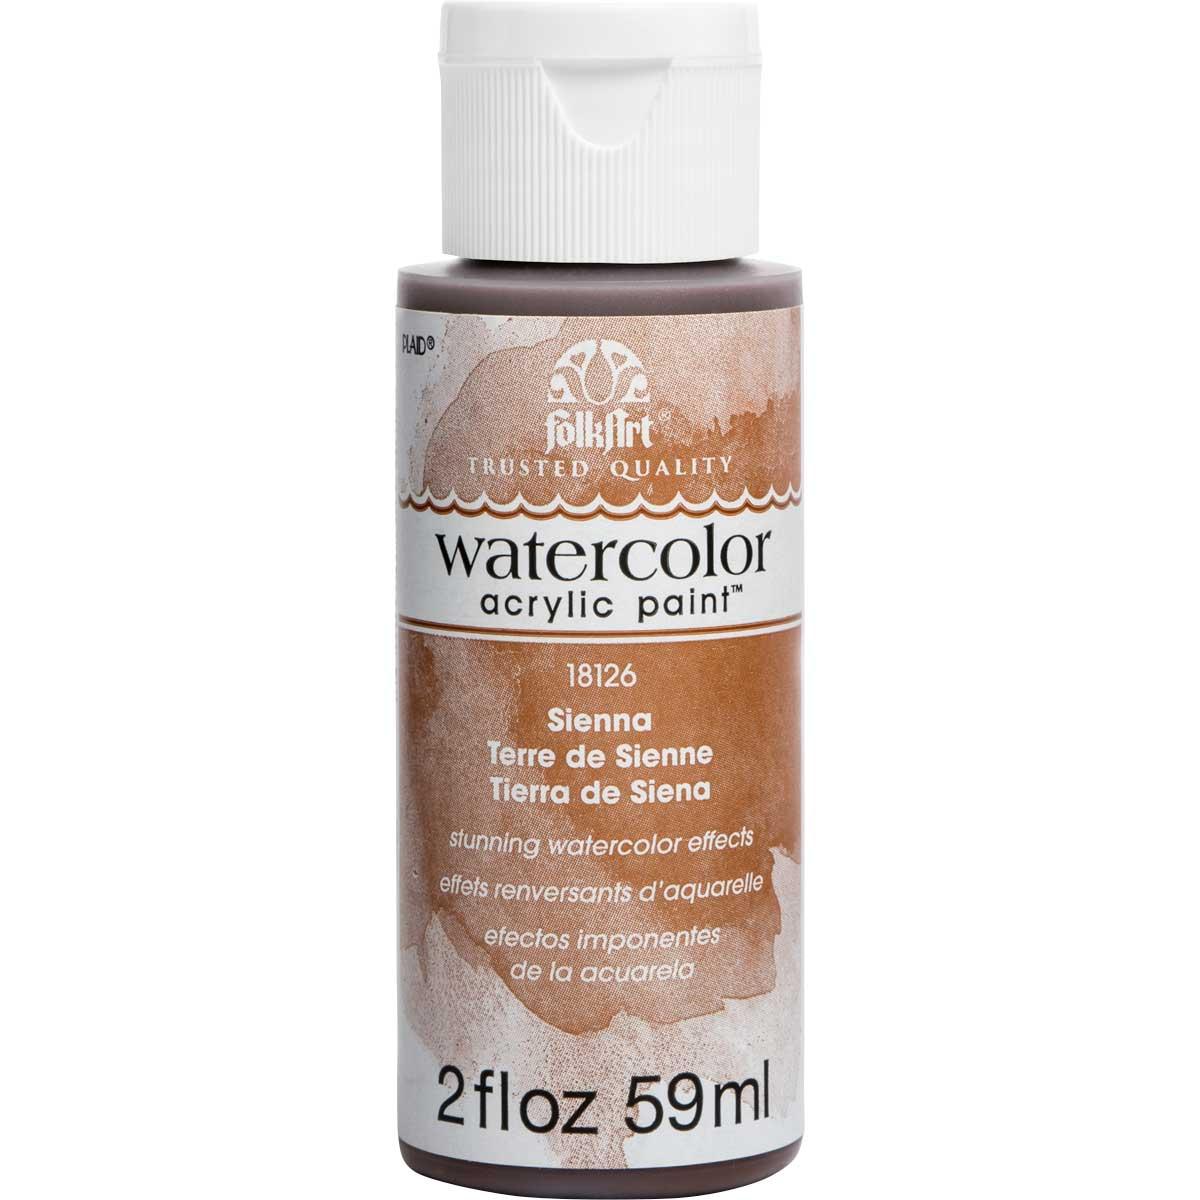 FolkArt ® Watercolor Acrylic Paint™ - Sienna, 2 oz.